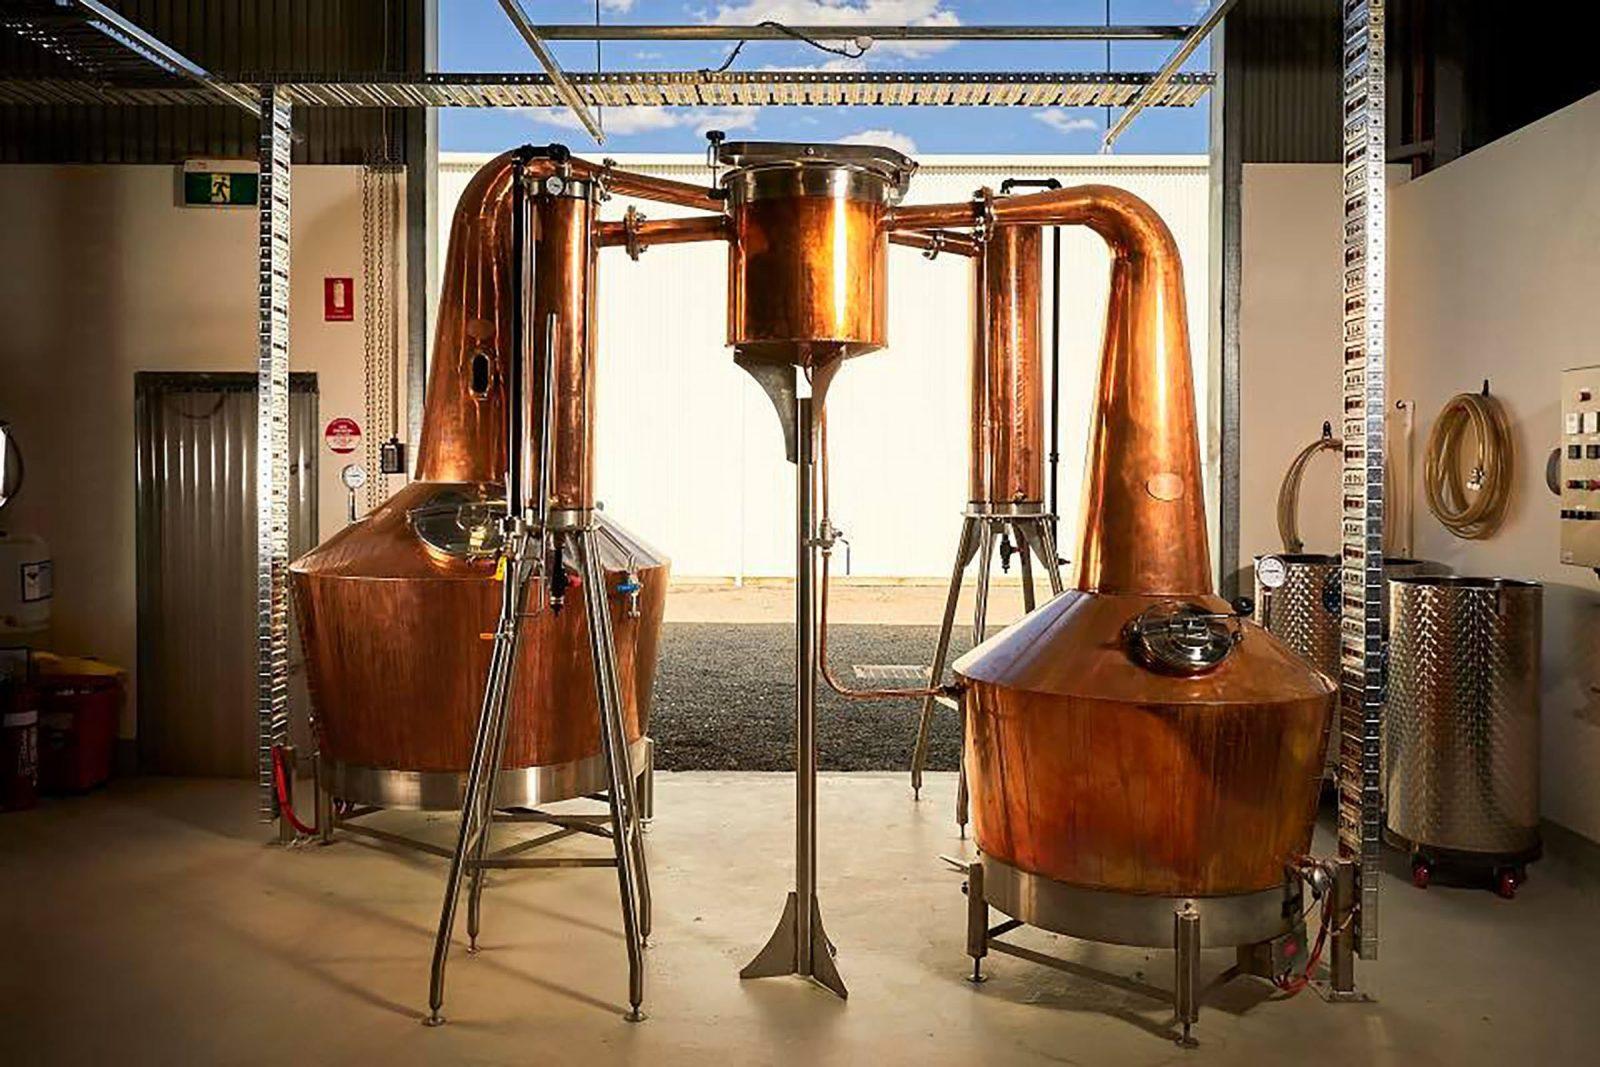 Visit Kilderkin Distillery in Ballarat for a distillery tour and a flight of gin